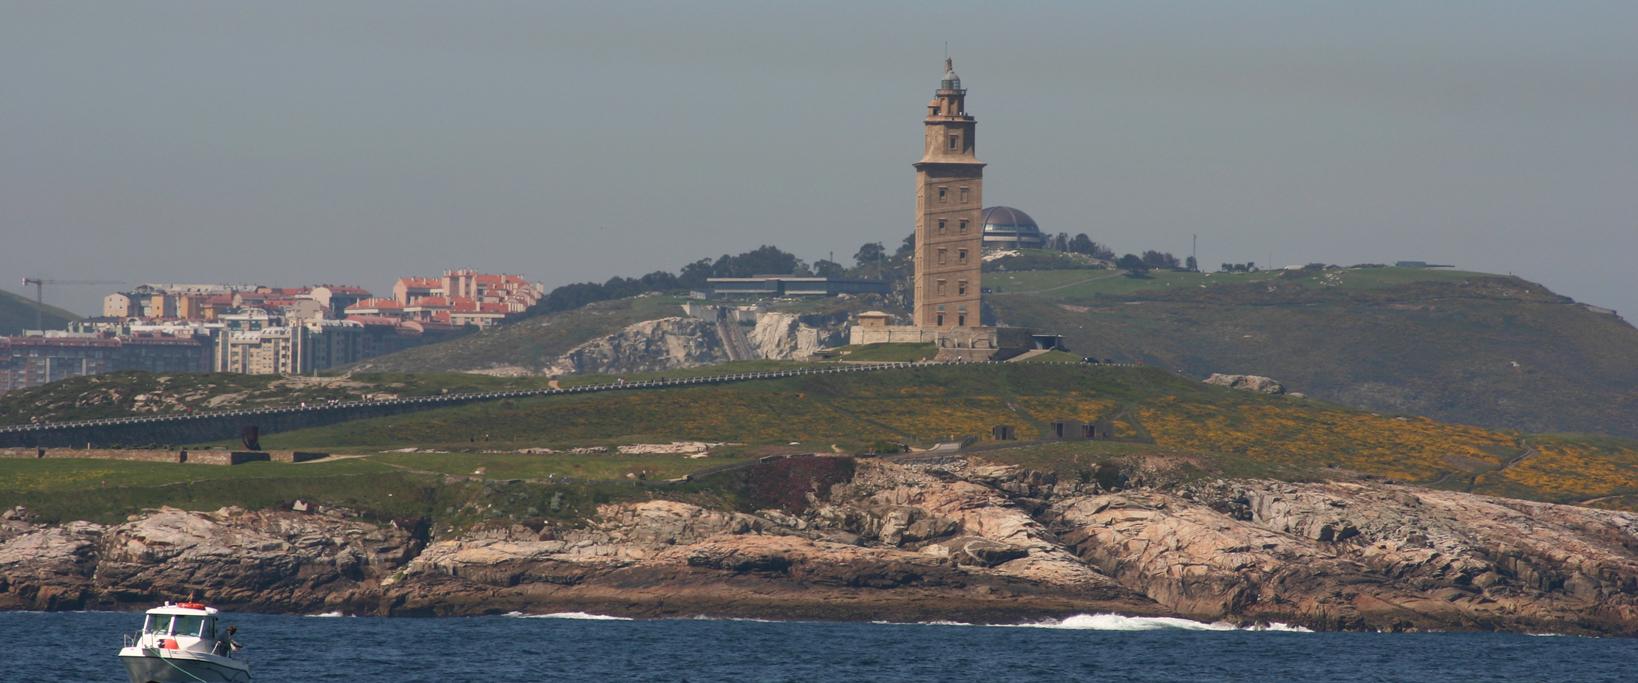 meezeilen Galicië Spanje